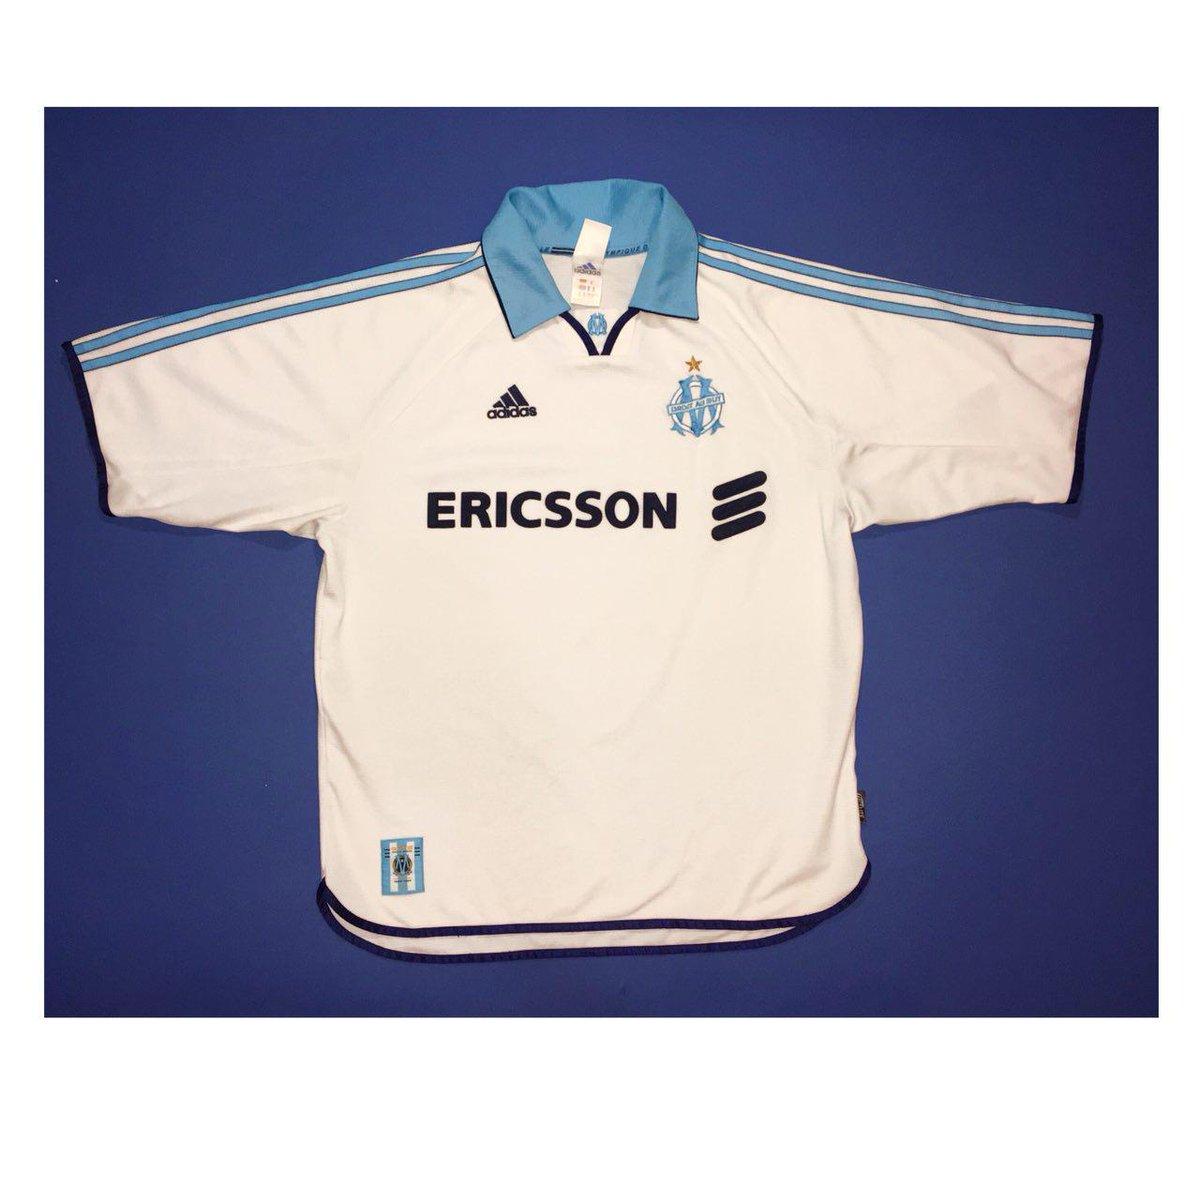 nouveau produit ba449 96f8d Stunner Football Kits on Twitter: